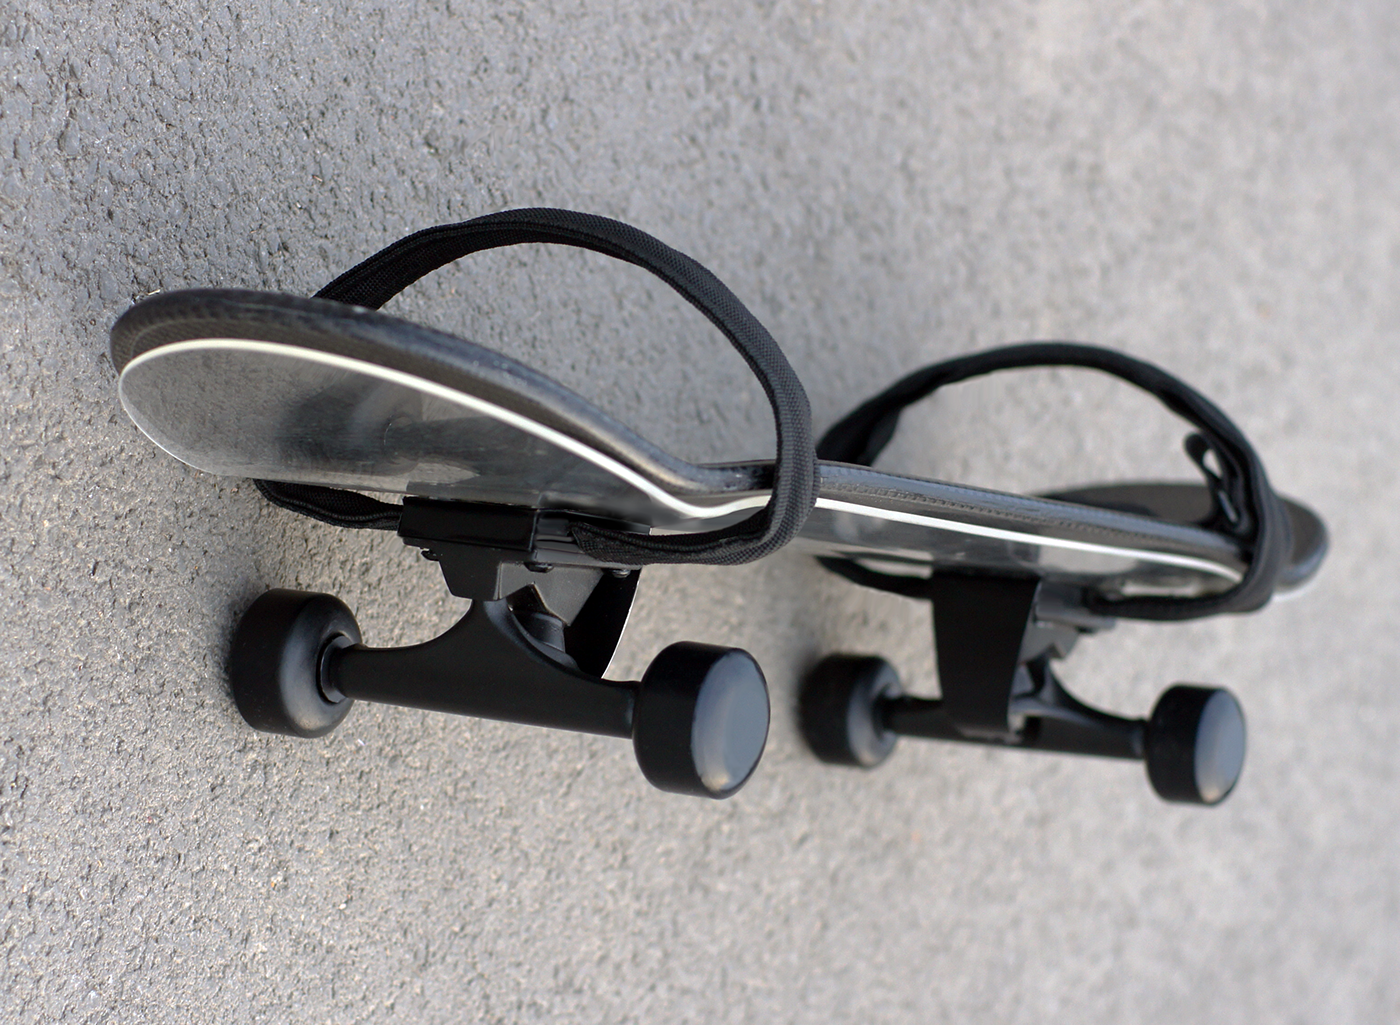 dark matter innovative skateboard carbon fiber skateboard black skateboard darko nikolic design black customizable Minimalism over-engineered skateboard